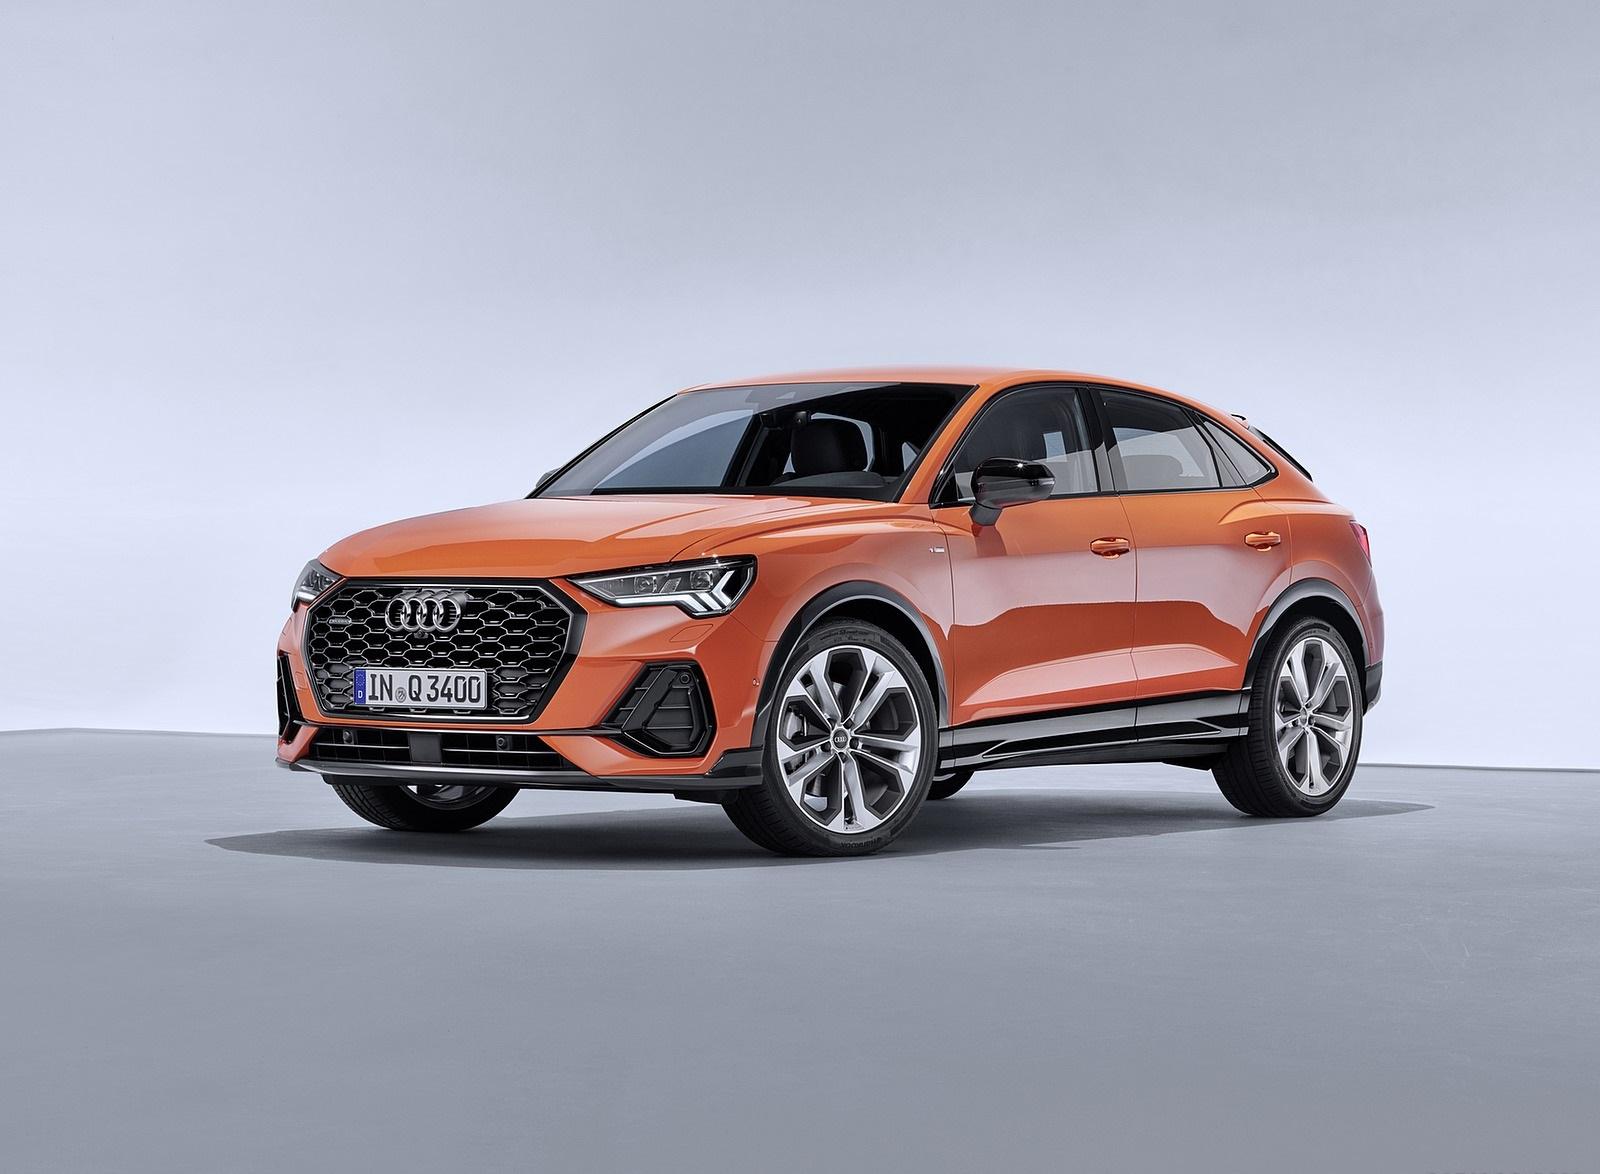 2020 Audi Q3 Sportback S line (Color: Pulse Orange) Front Three-Quarter Wallpapers (9)